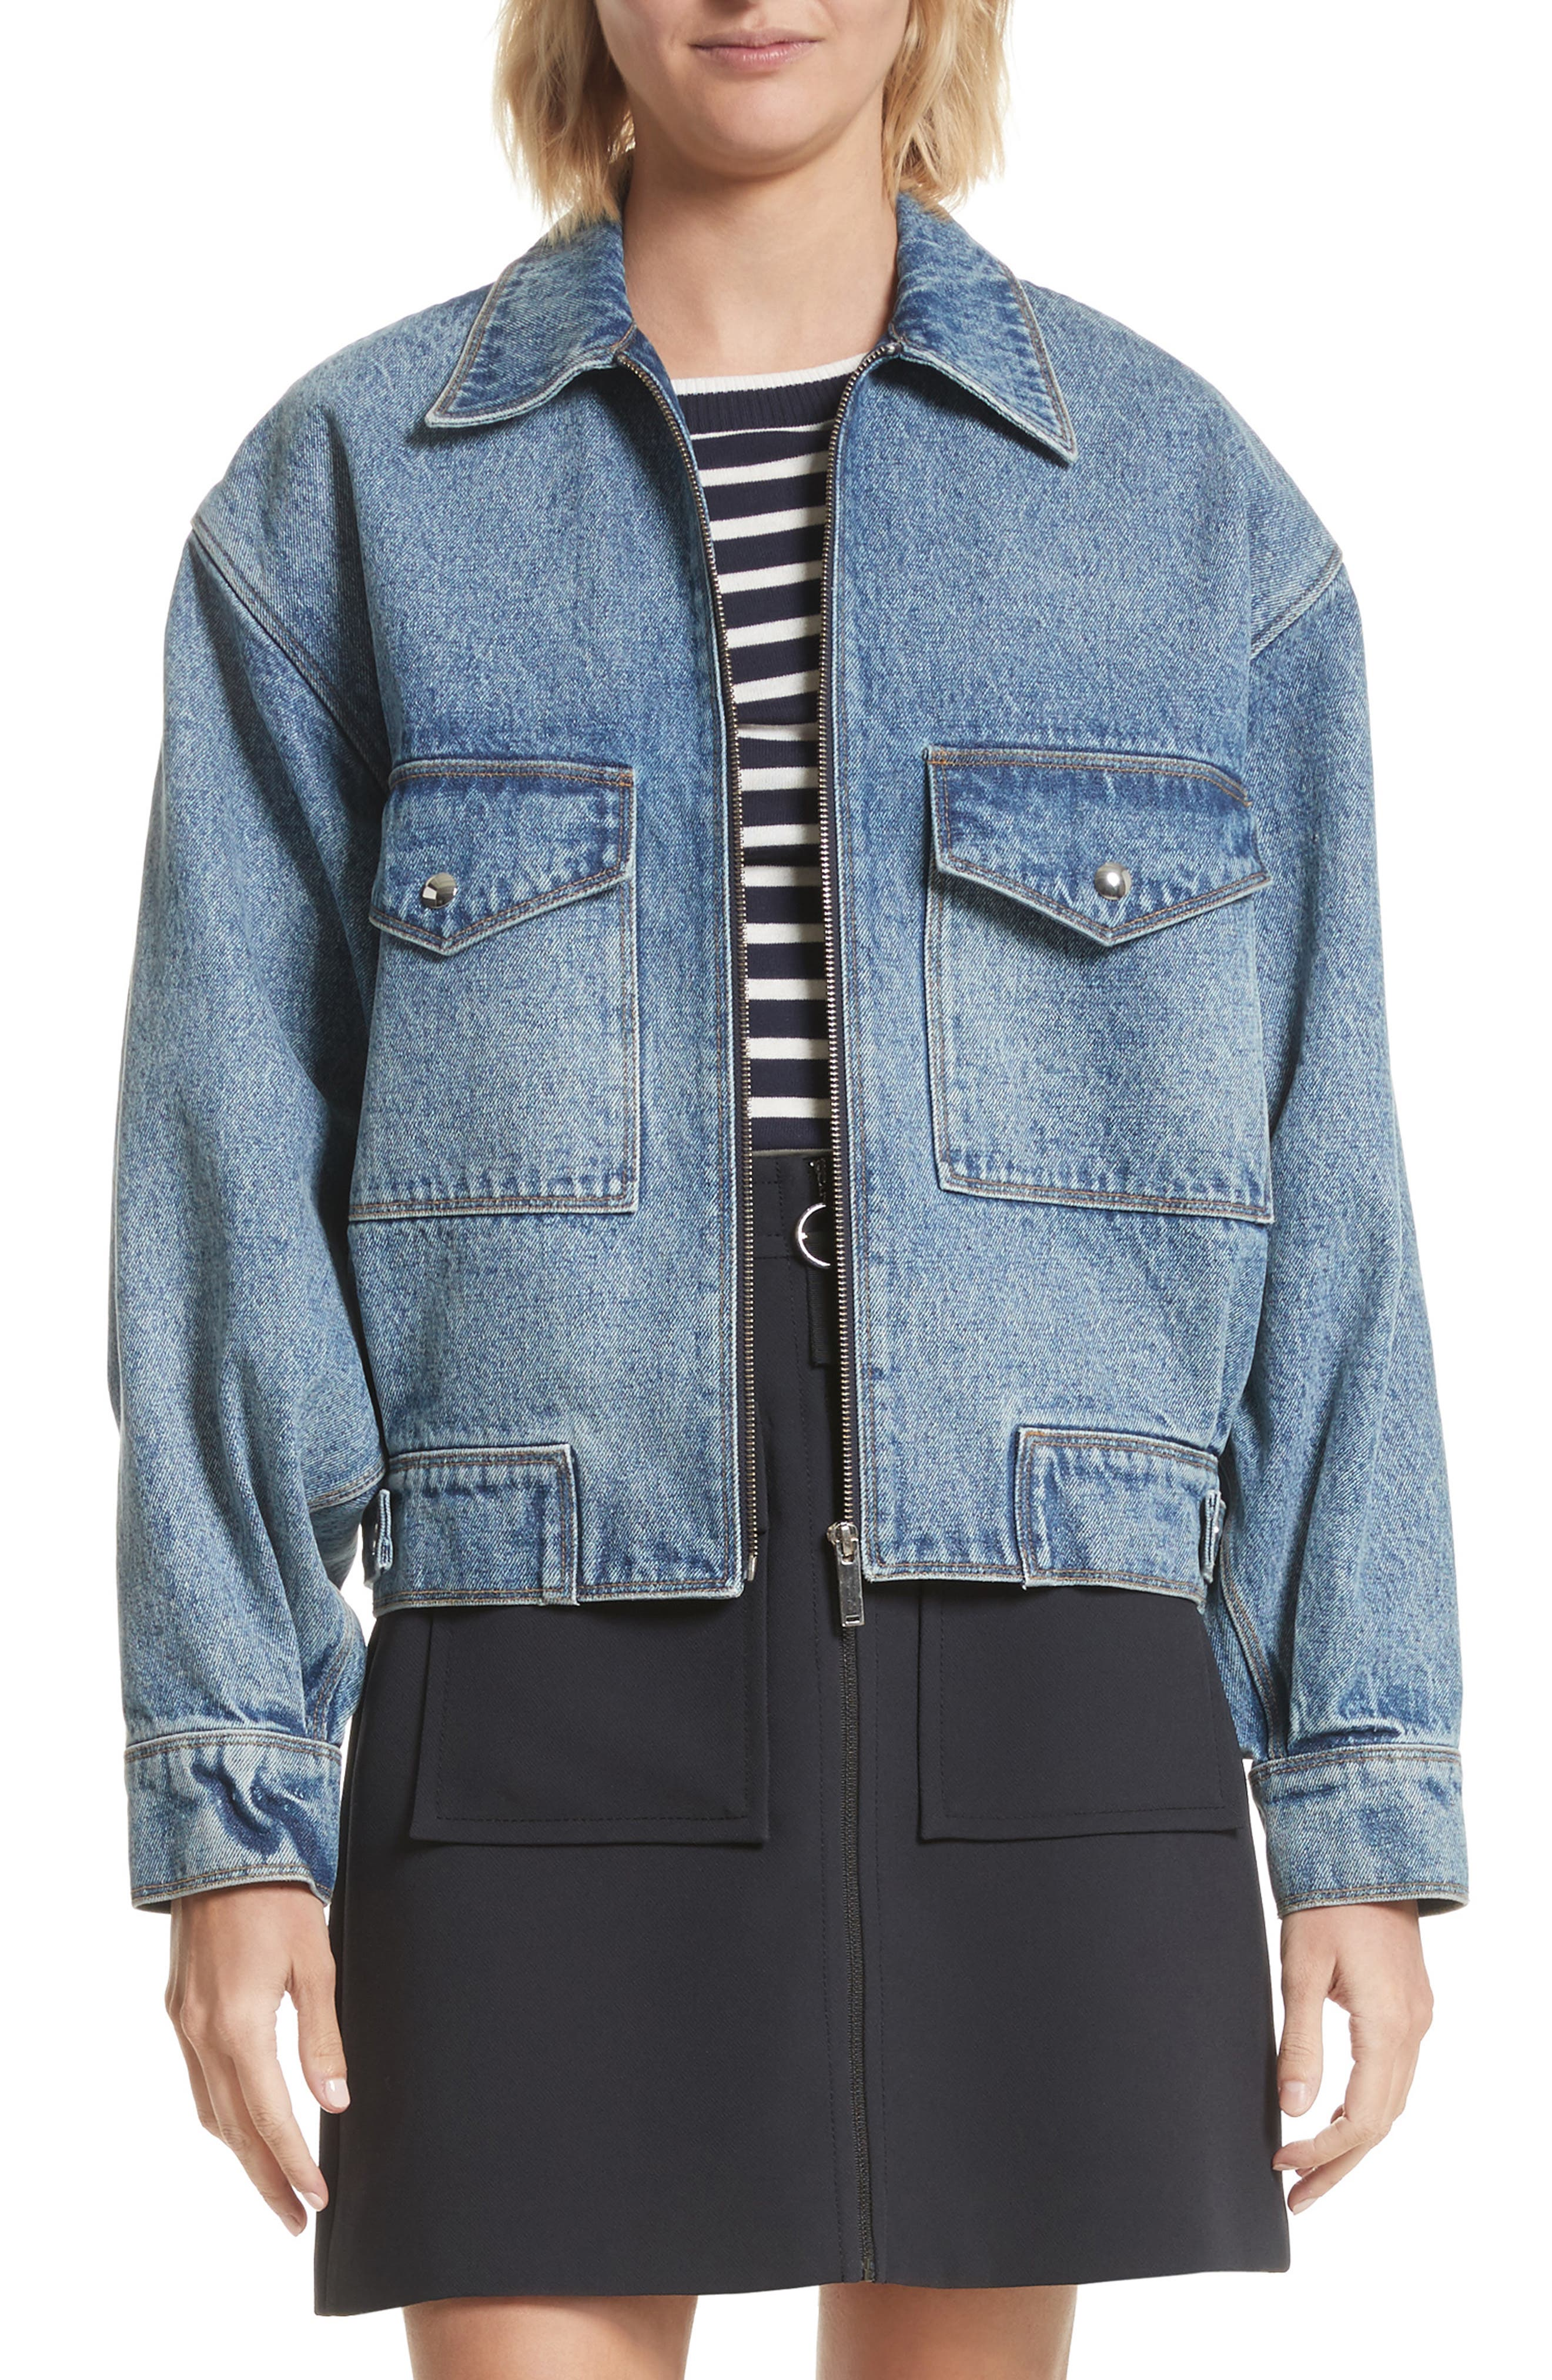 GREY Jason Wu Denim Jacket